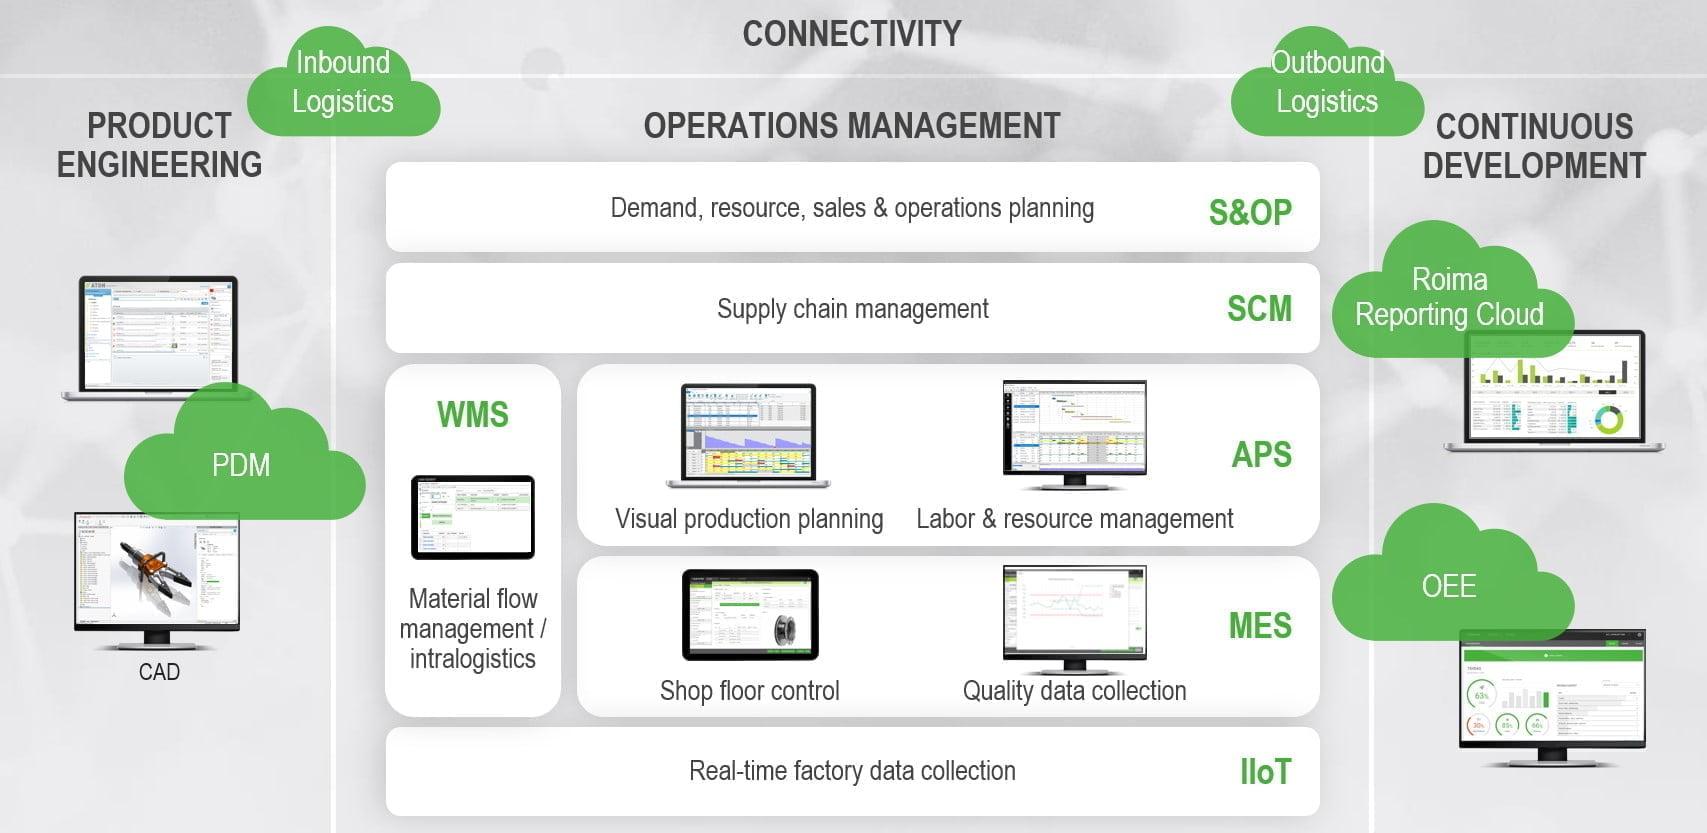 Equipment Manufacturing Suite RoimaSoftware Lean System Enterprise Resource Planning